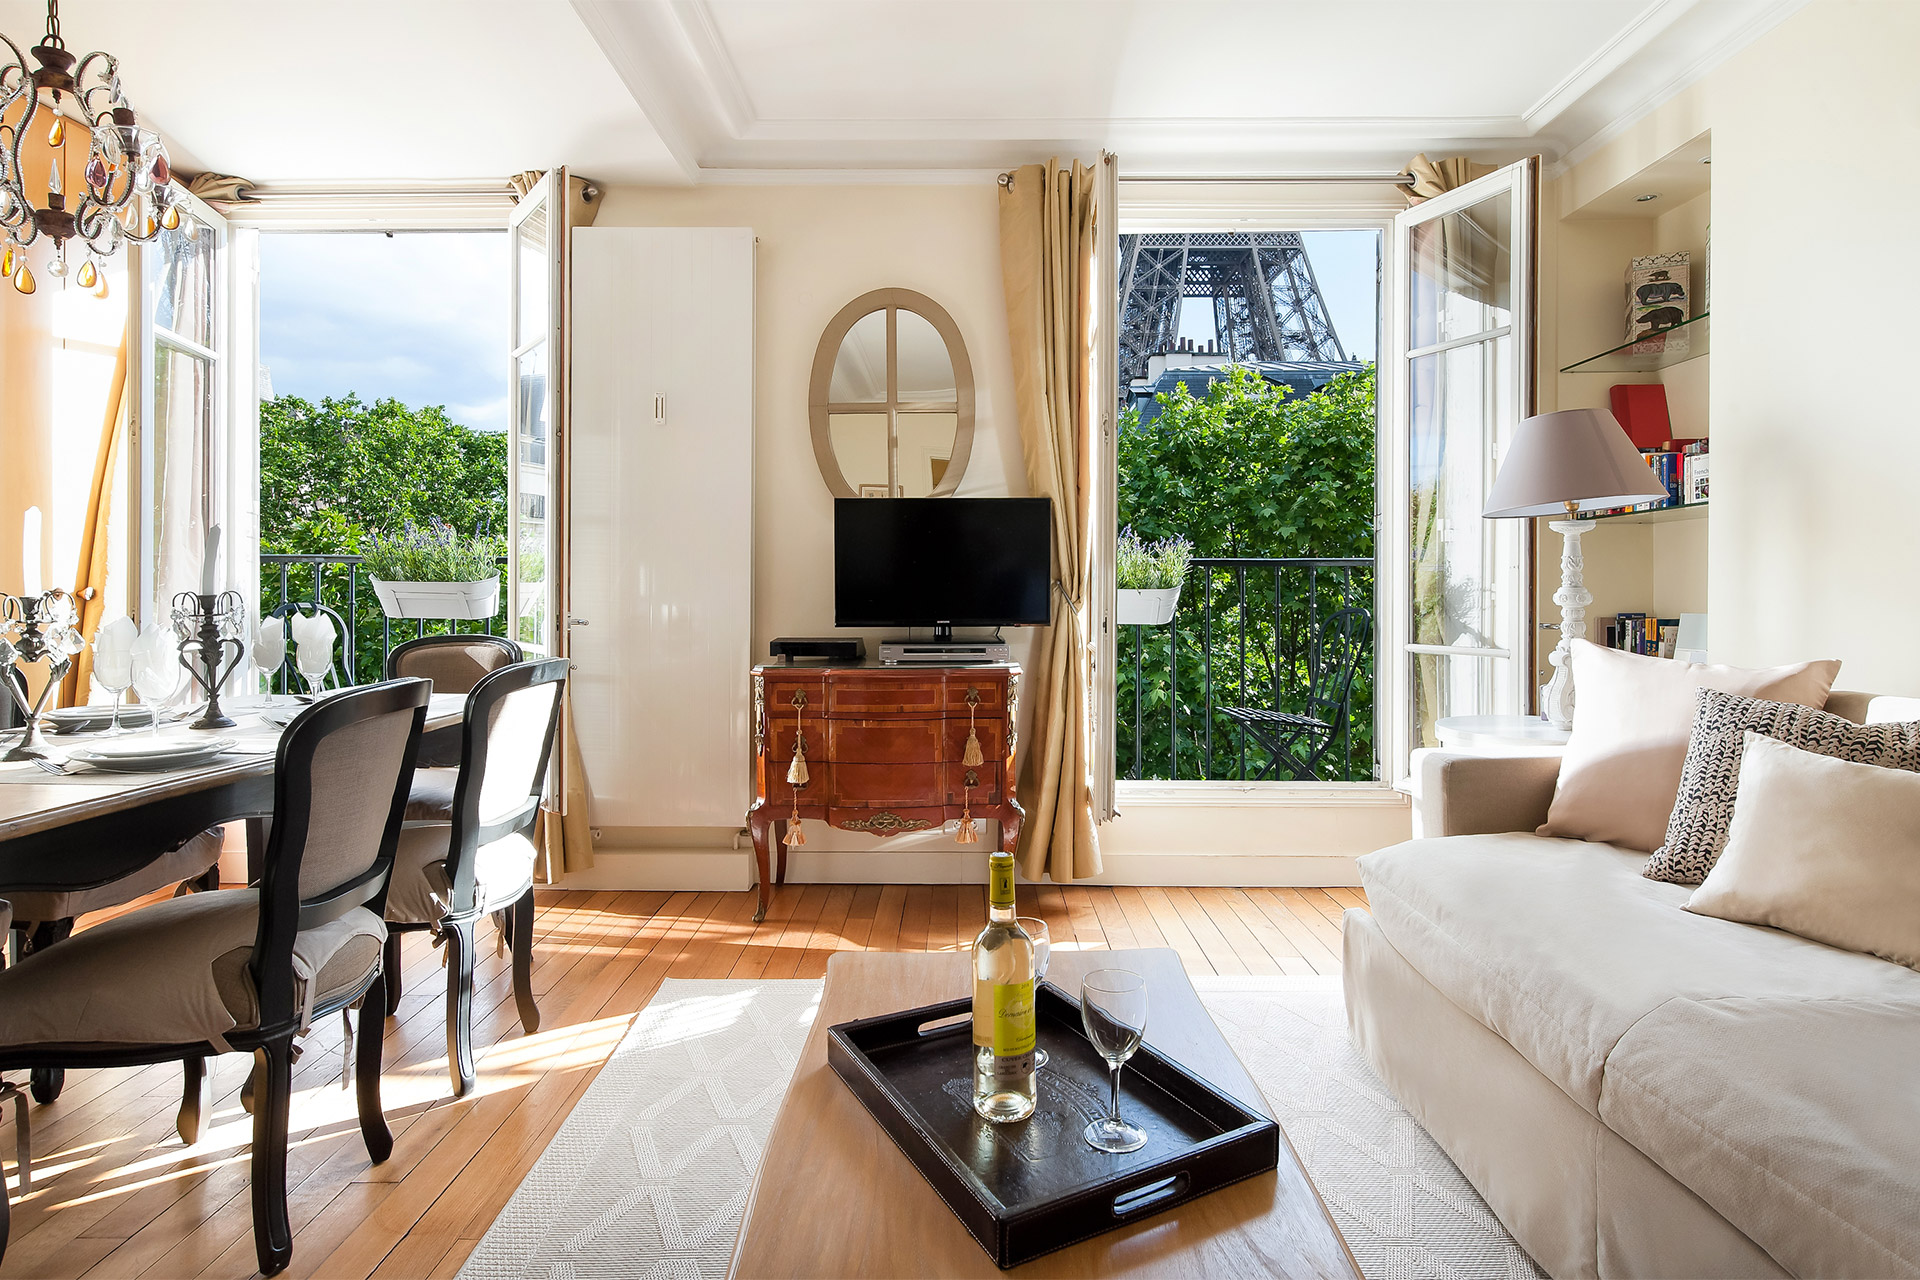 Book 3 Bedroom Apartment Rental Paris on the Left Bank ...